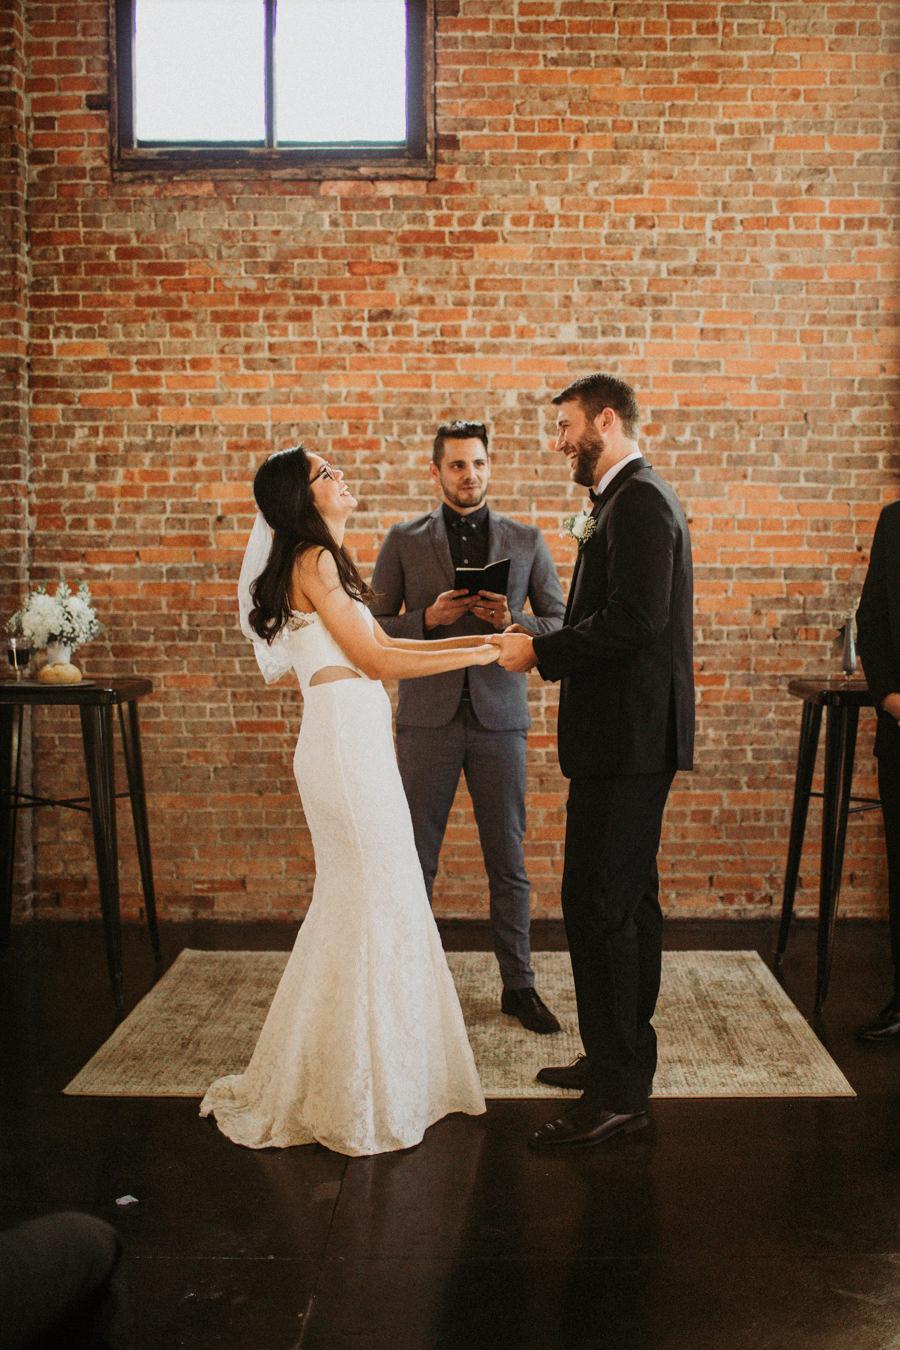 Tampa Heights Industrial Wedding at Cavu Emmy RJ-68.jpg